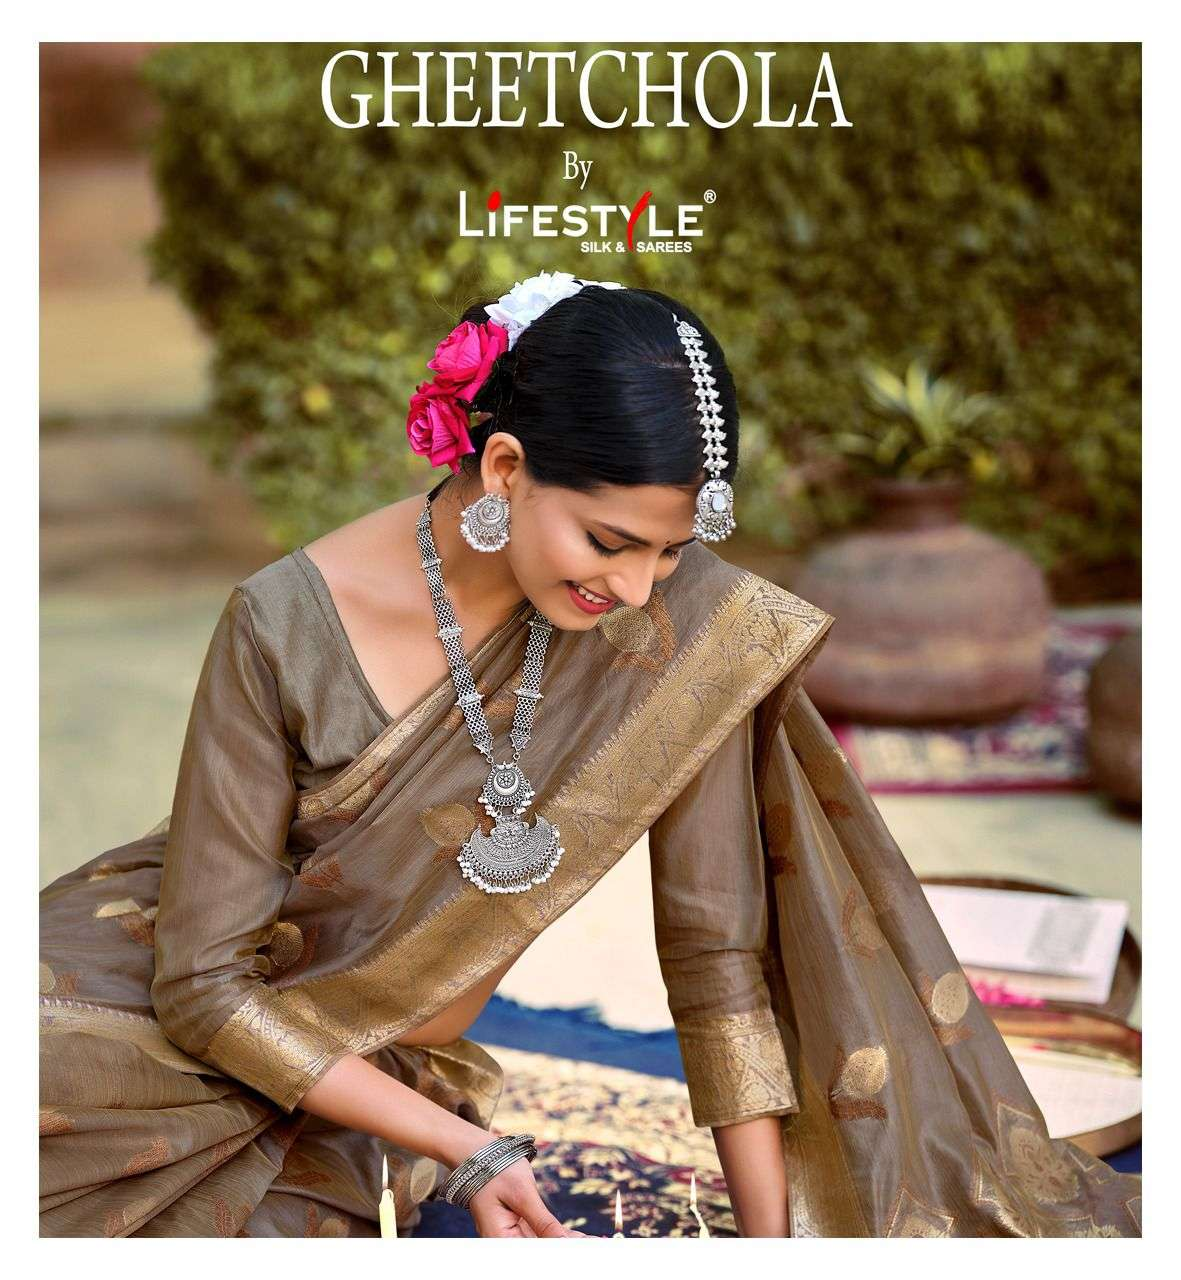 Lifestyle Geethchola Exclusive Fancy Organza Saree Catalog Wholesaler